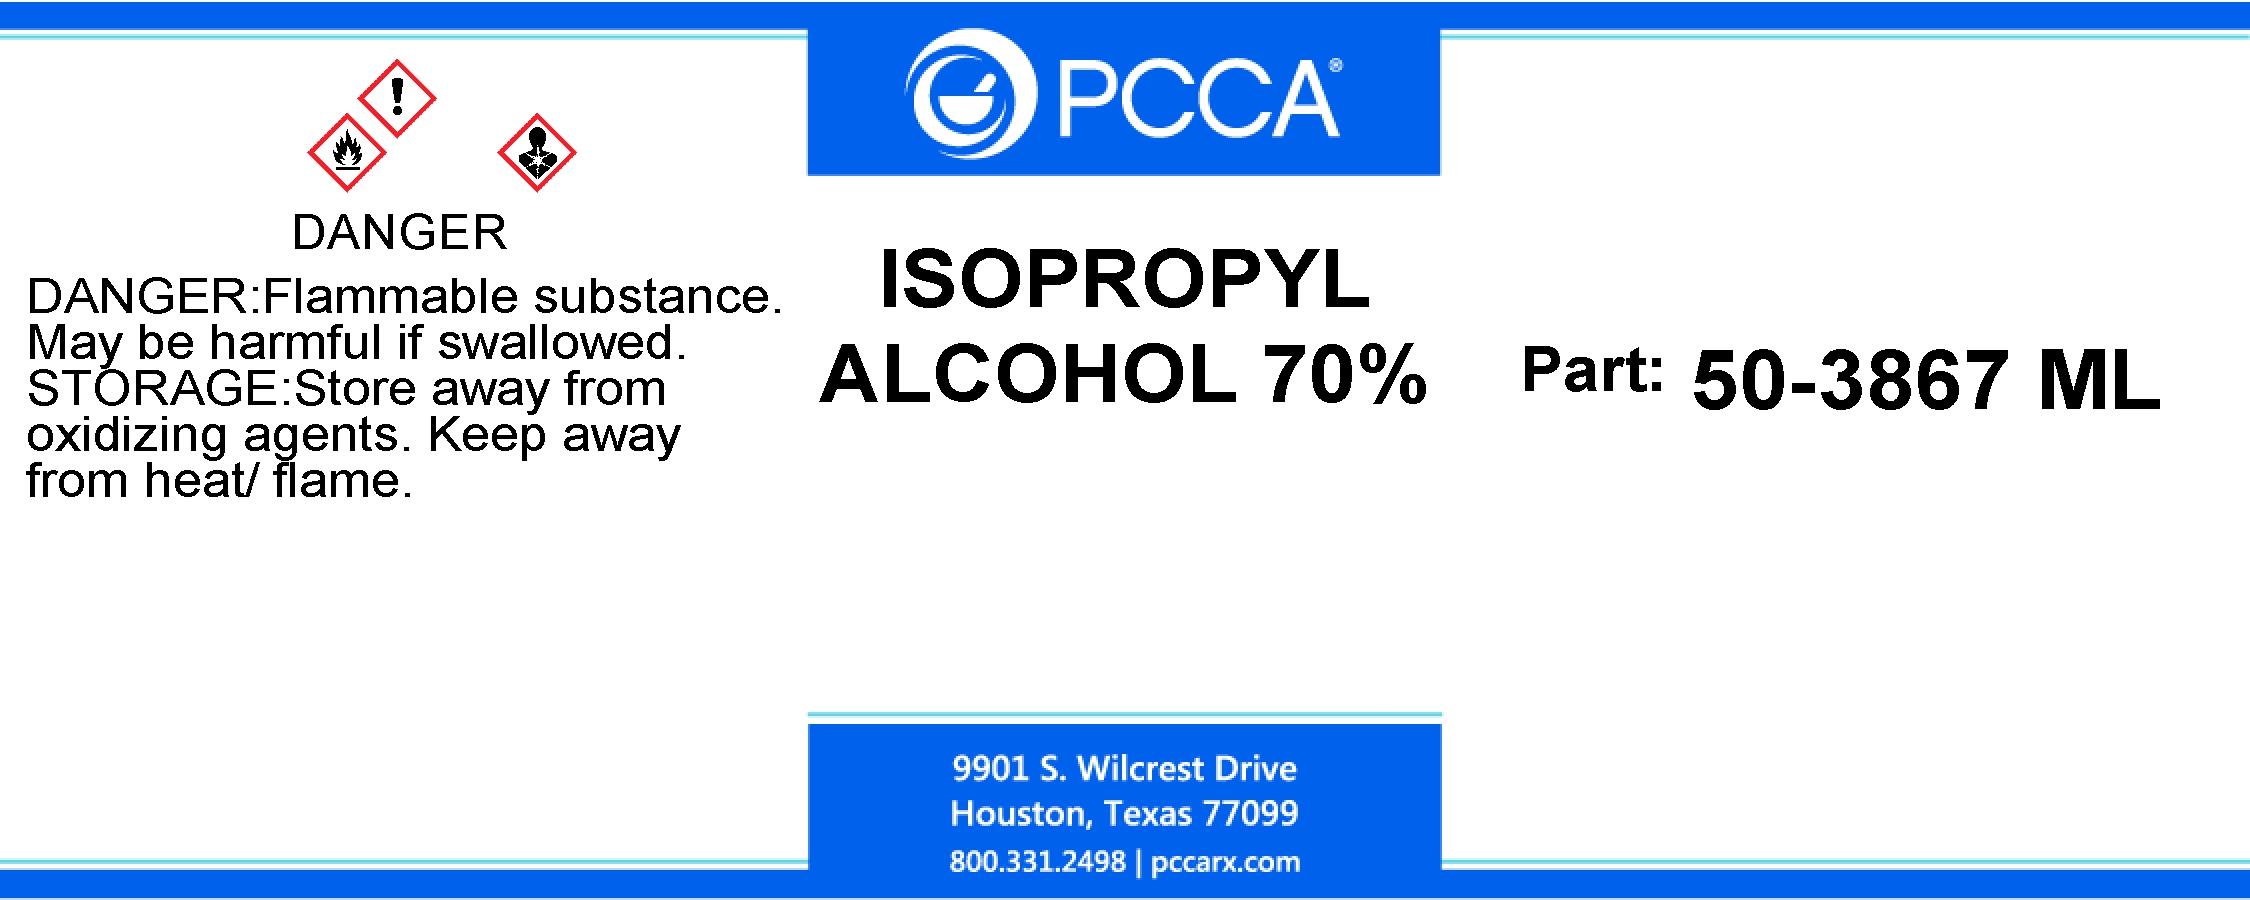 ISOPROPYL ALCOHOL 70% - PCCA